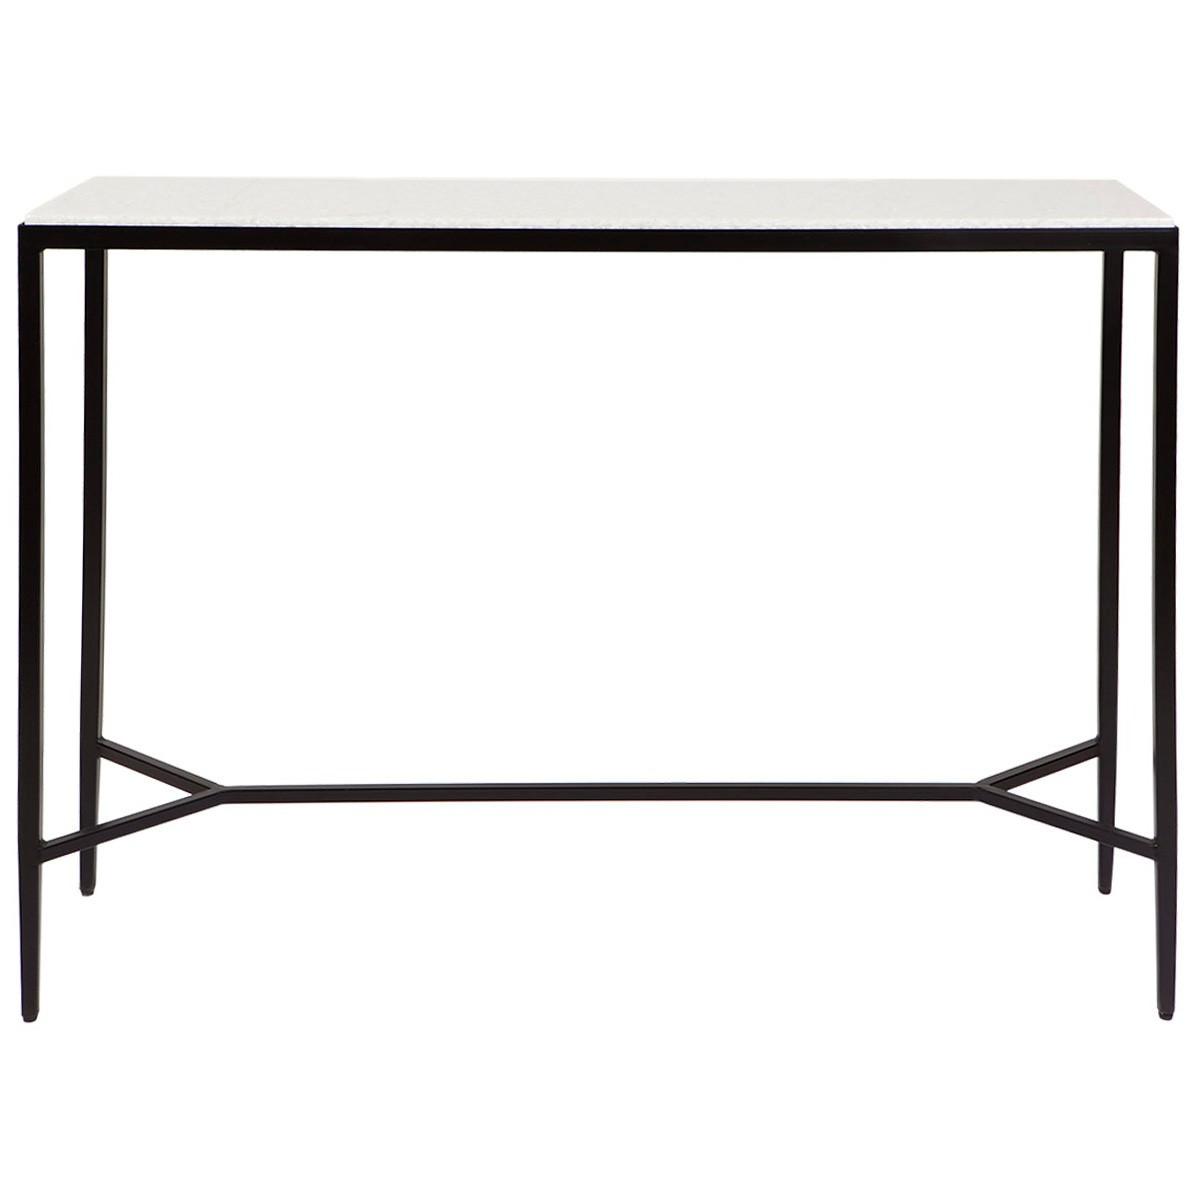 Chloe Stone & Iron Console Table, 110cm, Black